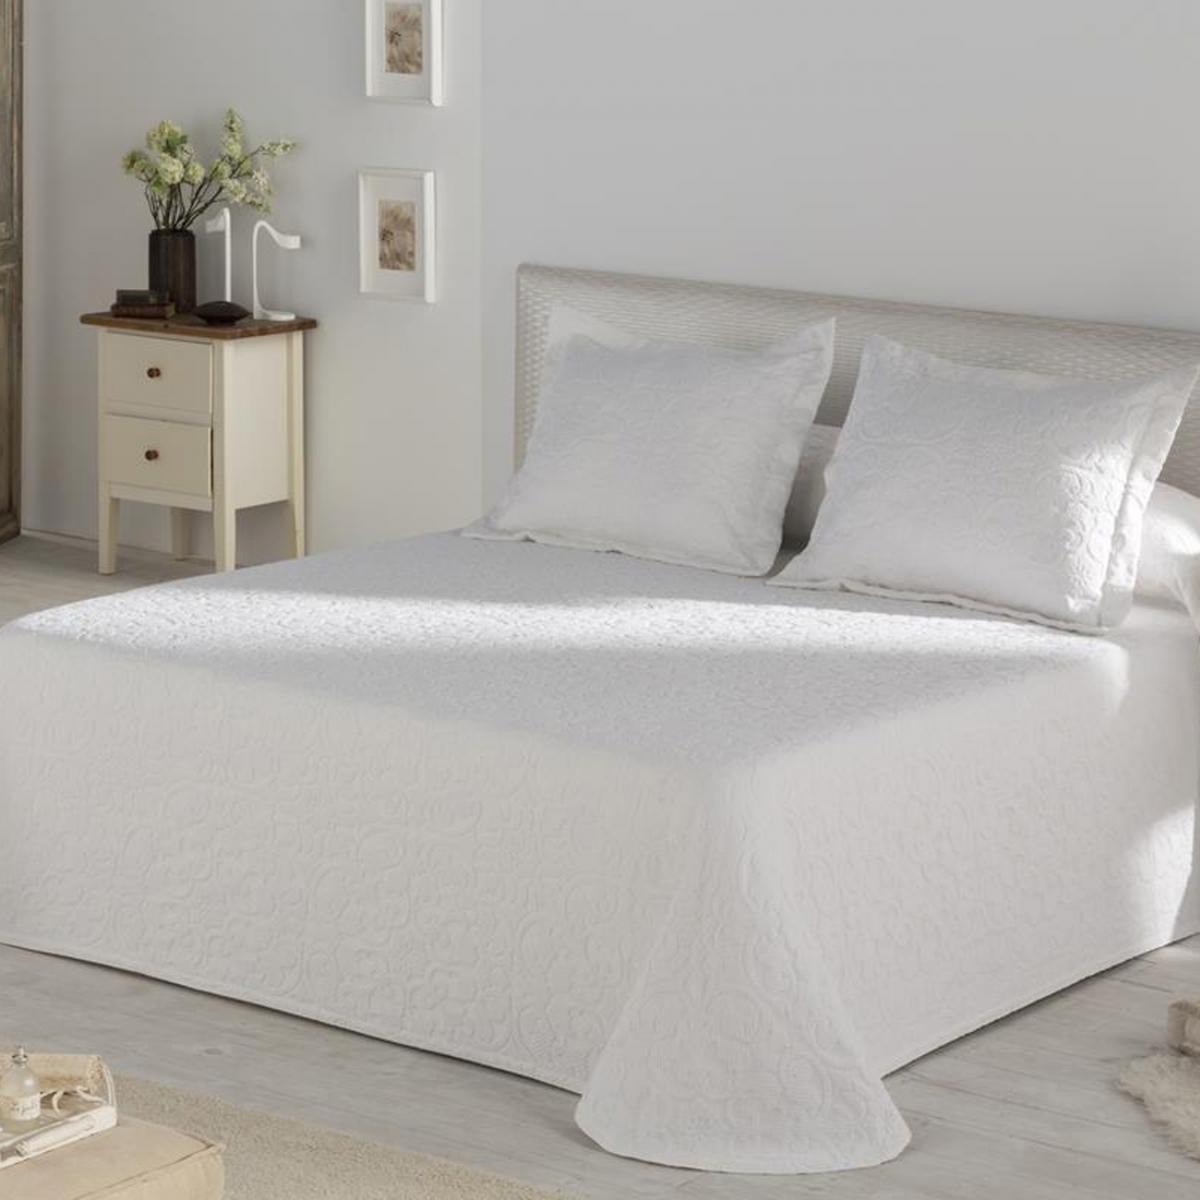 COLCHA PIQUE VENICE 000 - Blanco 120 cms 000 - Blanco 150 cms 000 - Blanco 160 cms 000 - Blanco 180 cms